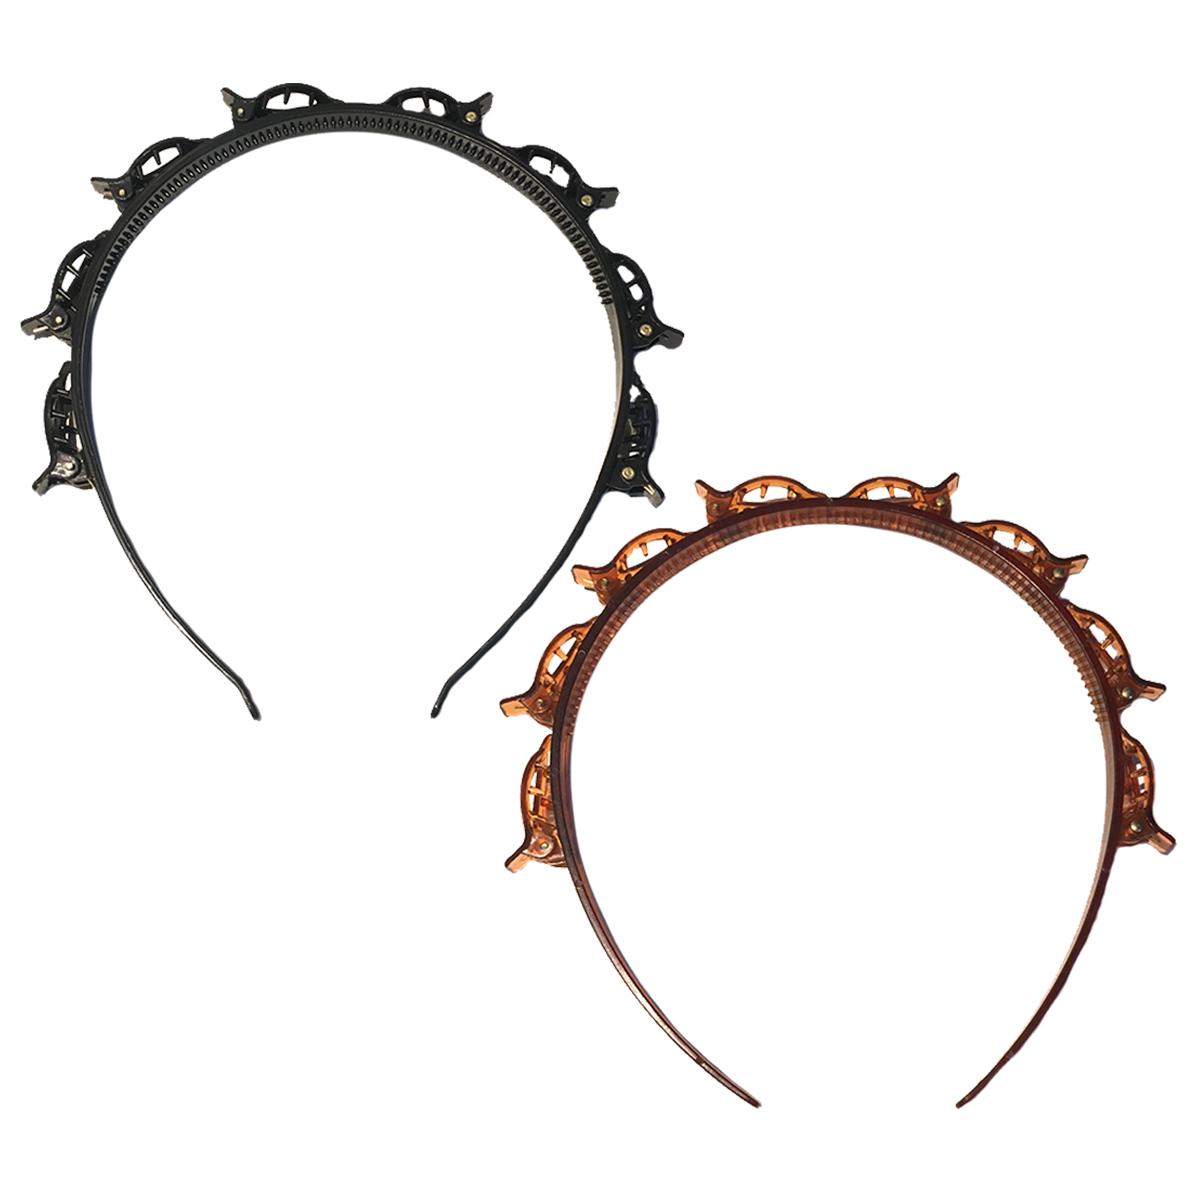 Kit 2 Tiara c/ Presilha Arco Cabelo Moda Hair Twister Penteado